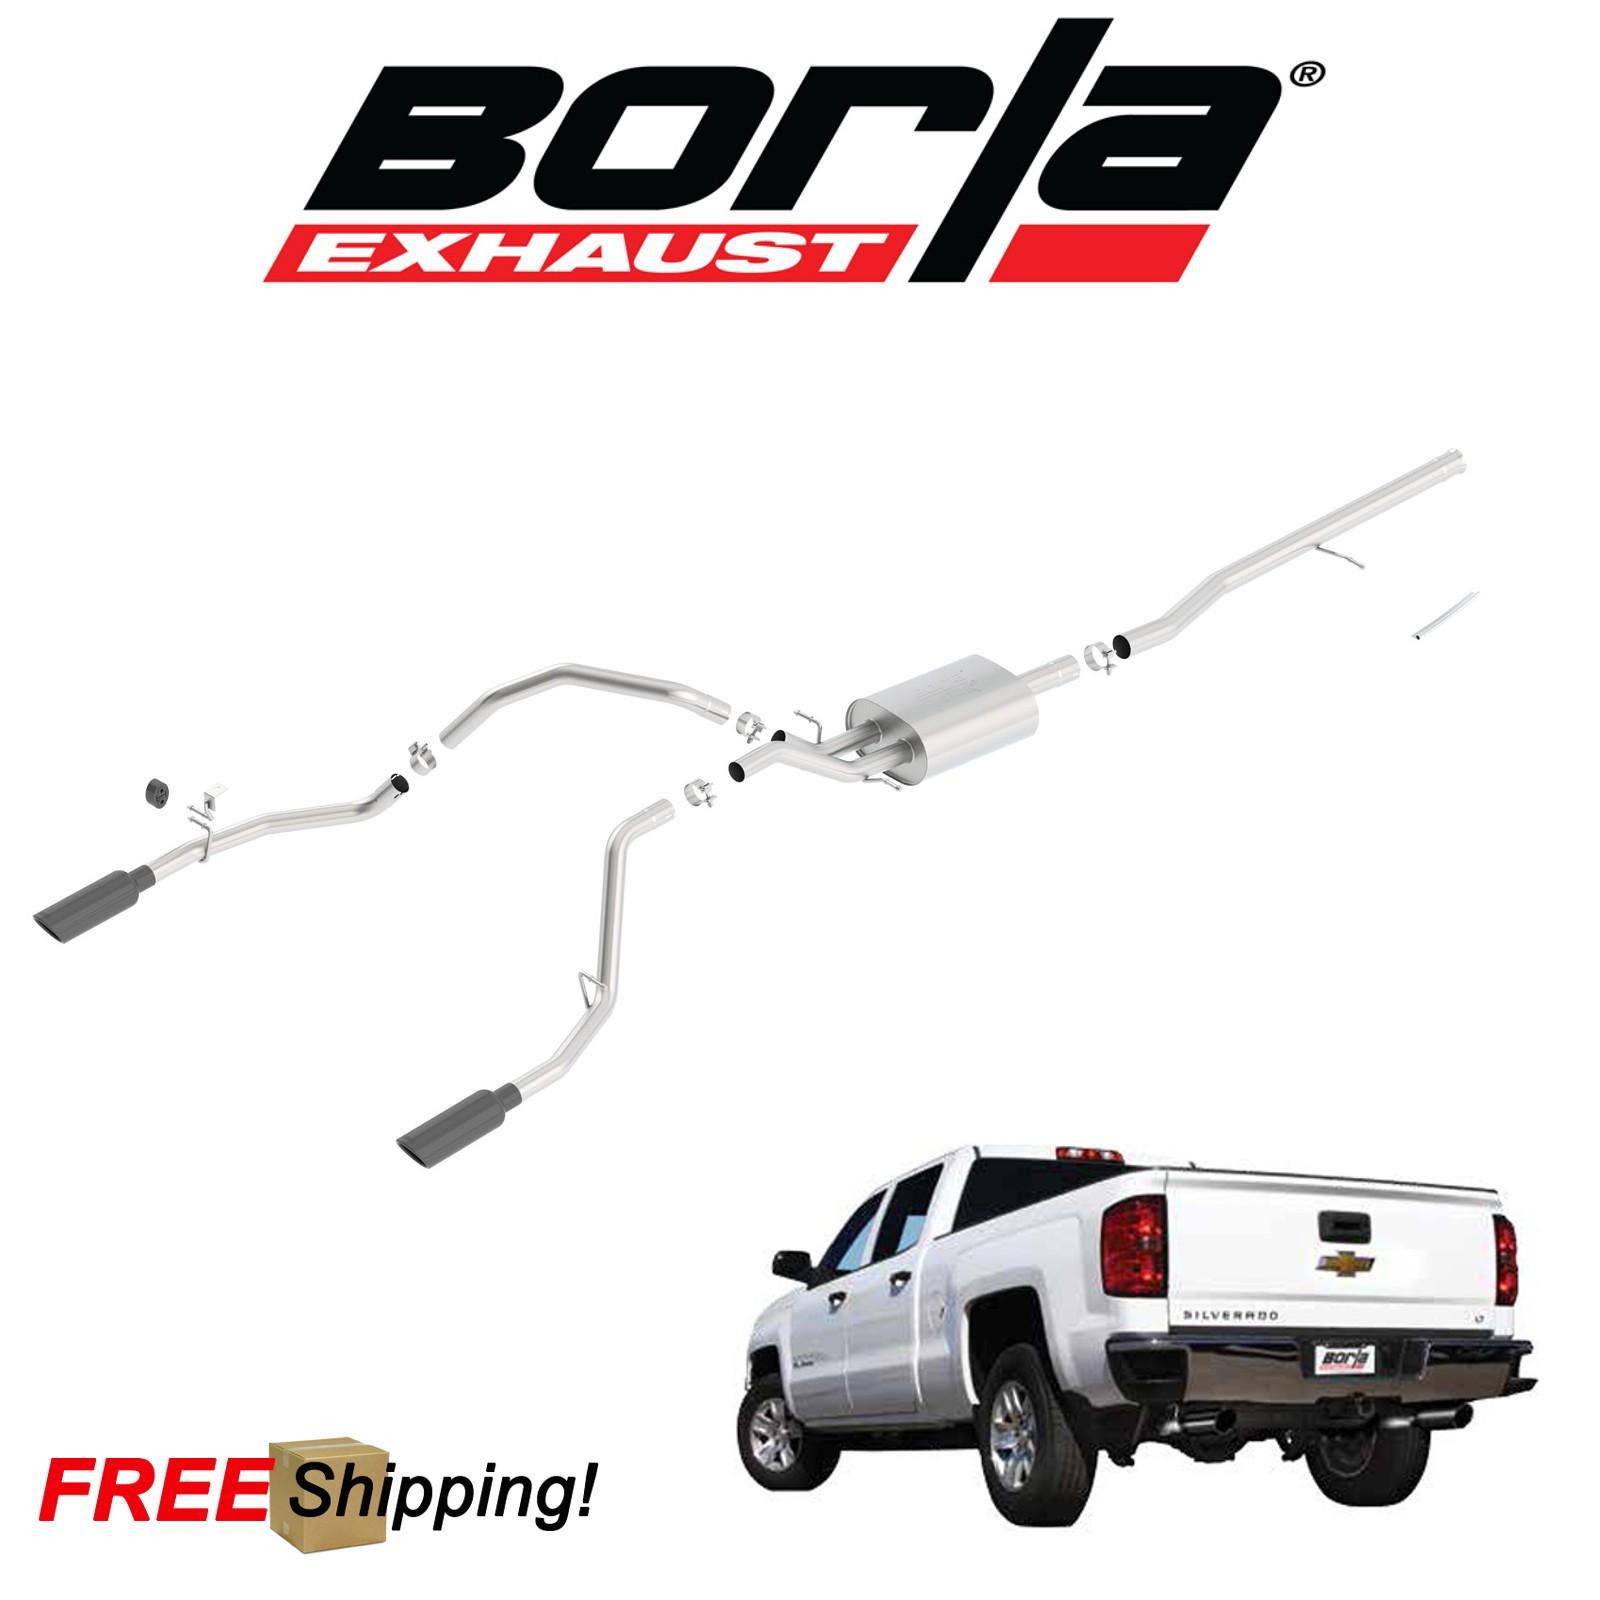 details about borla s type cat back performance dual exhaust 2014 2018 gmc sierra 1500 5 3l v8